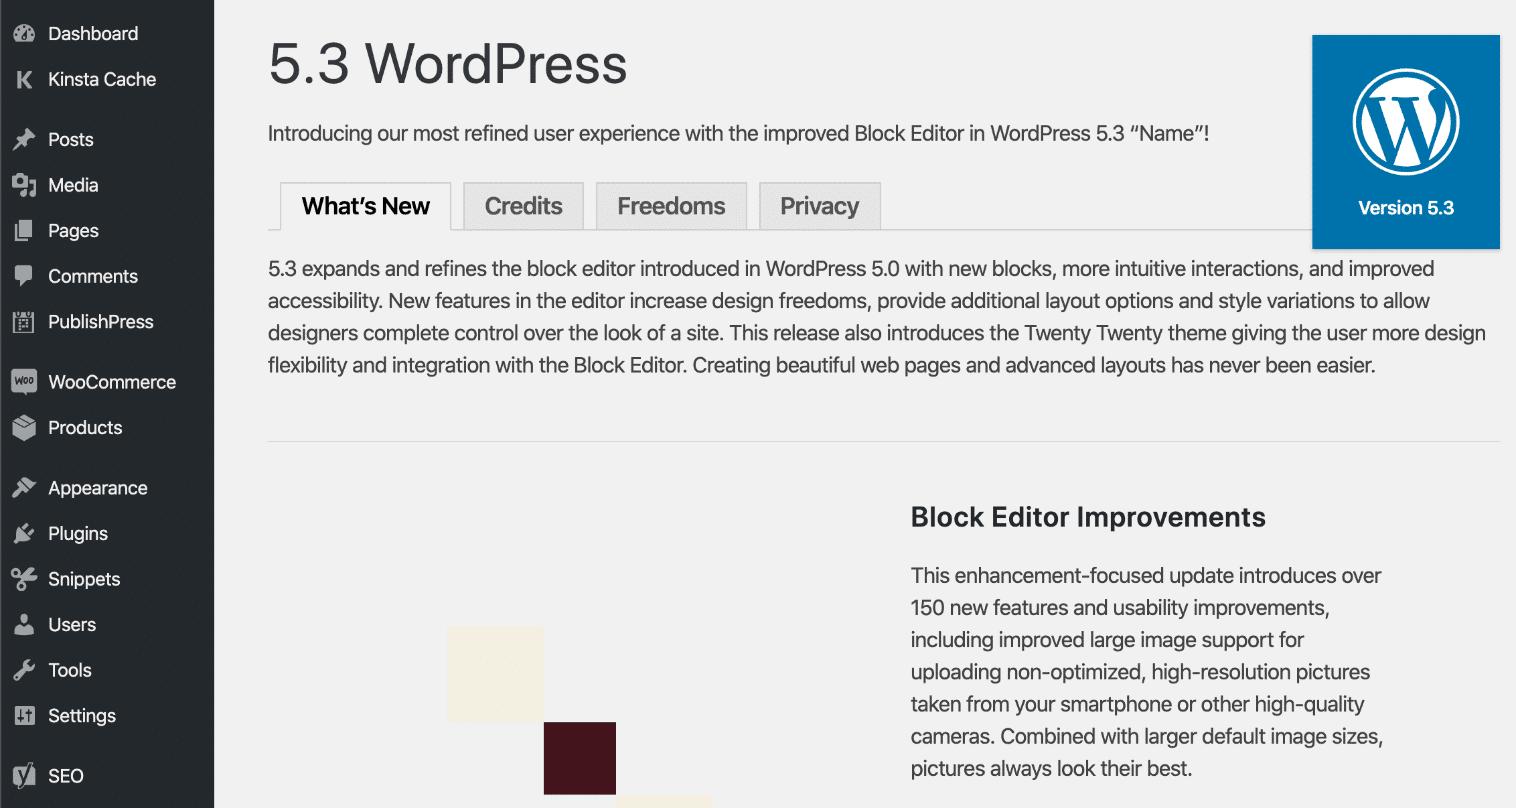 WordPress 5.3 welcome screen